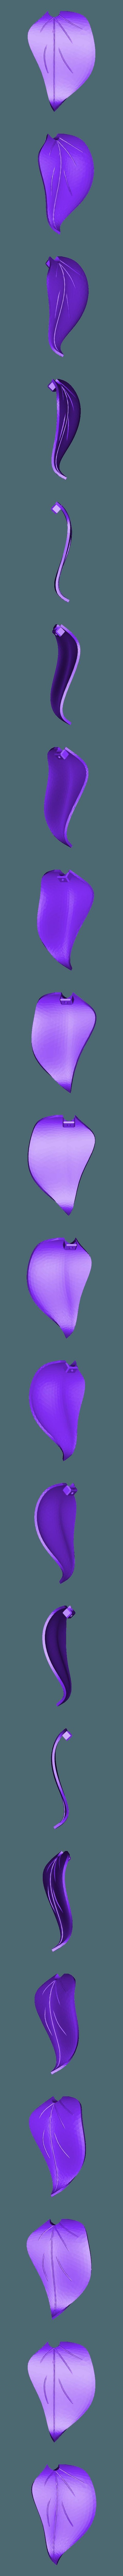 DFX__Rose_ver_3_p3.stl Download STL file happy birthday grandma • 3D print object, ced57